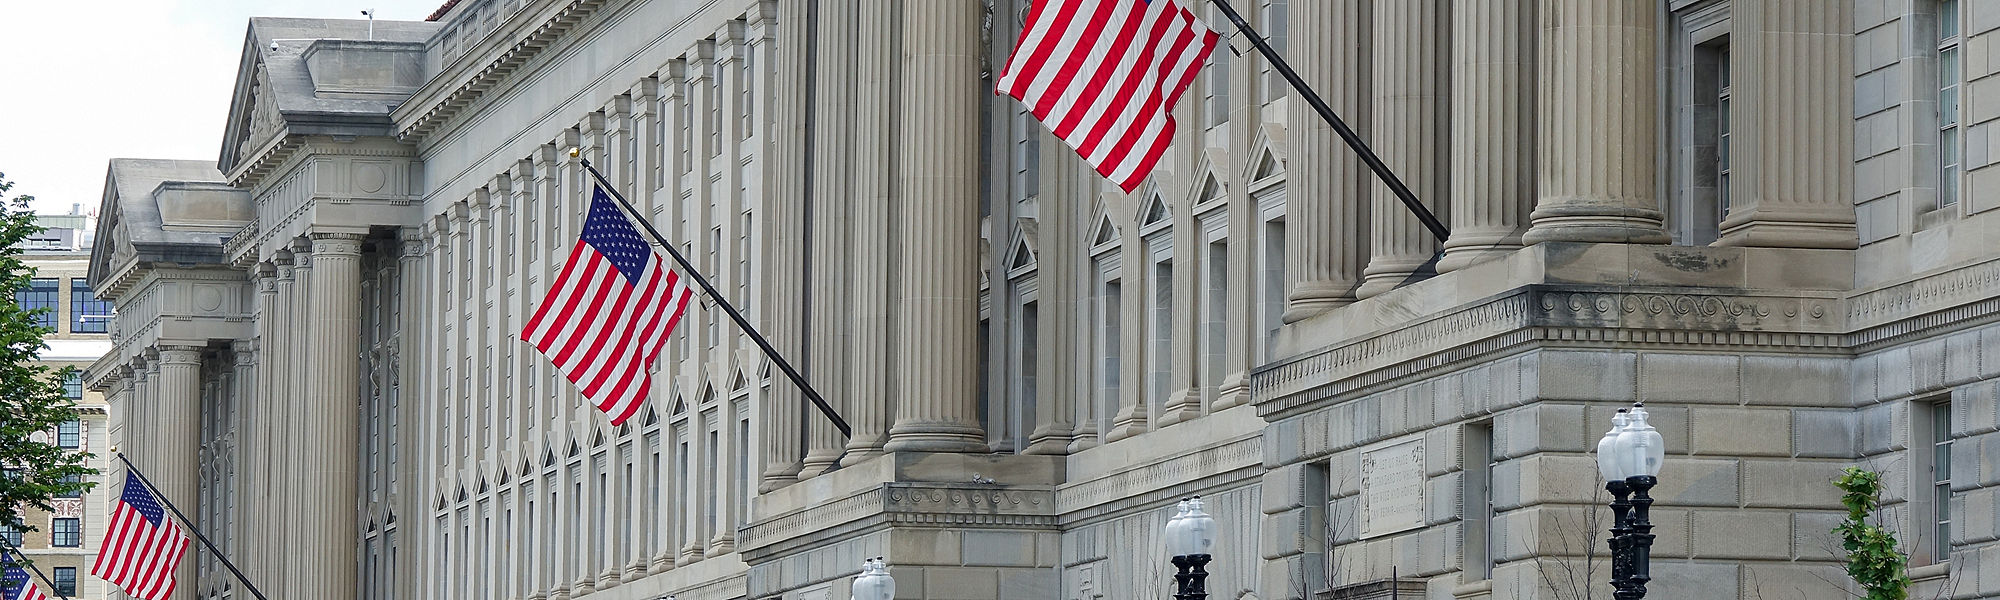 US Department of Commerce Washington DC